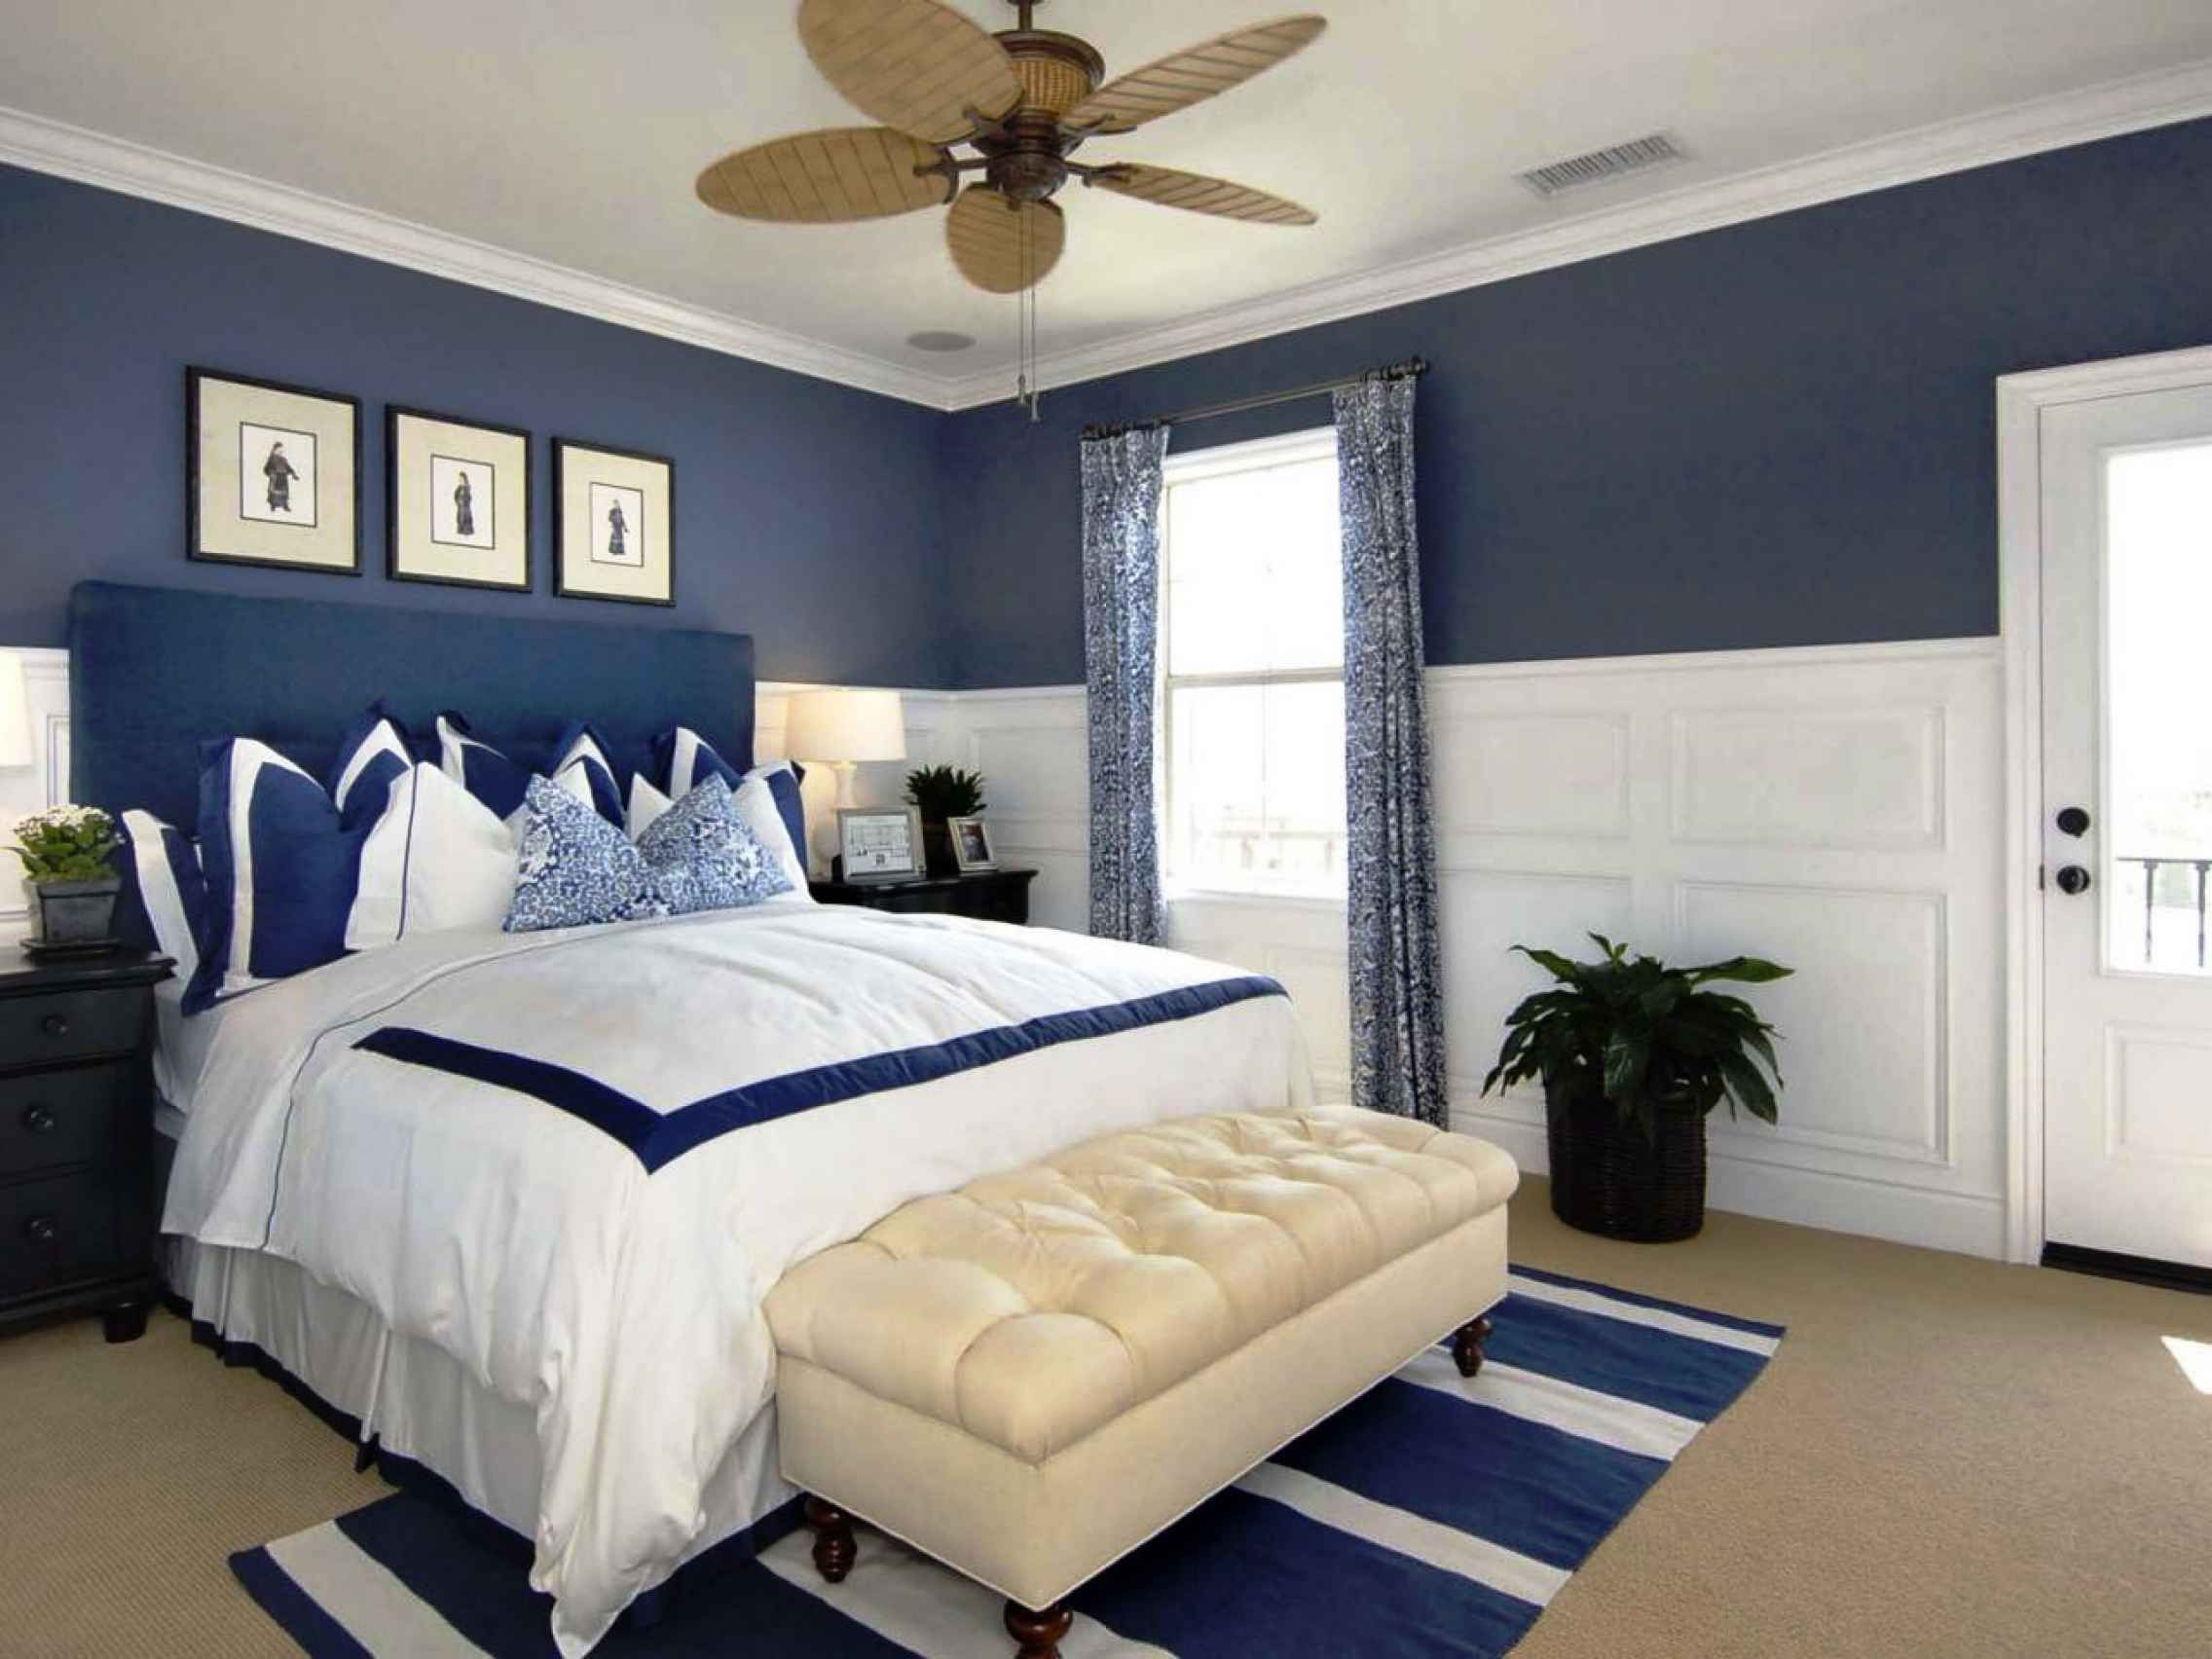 youtube interior decorating ideas design decor watch beach house nautical bedroom themed